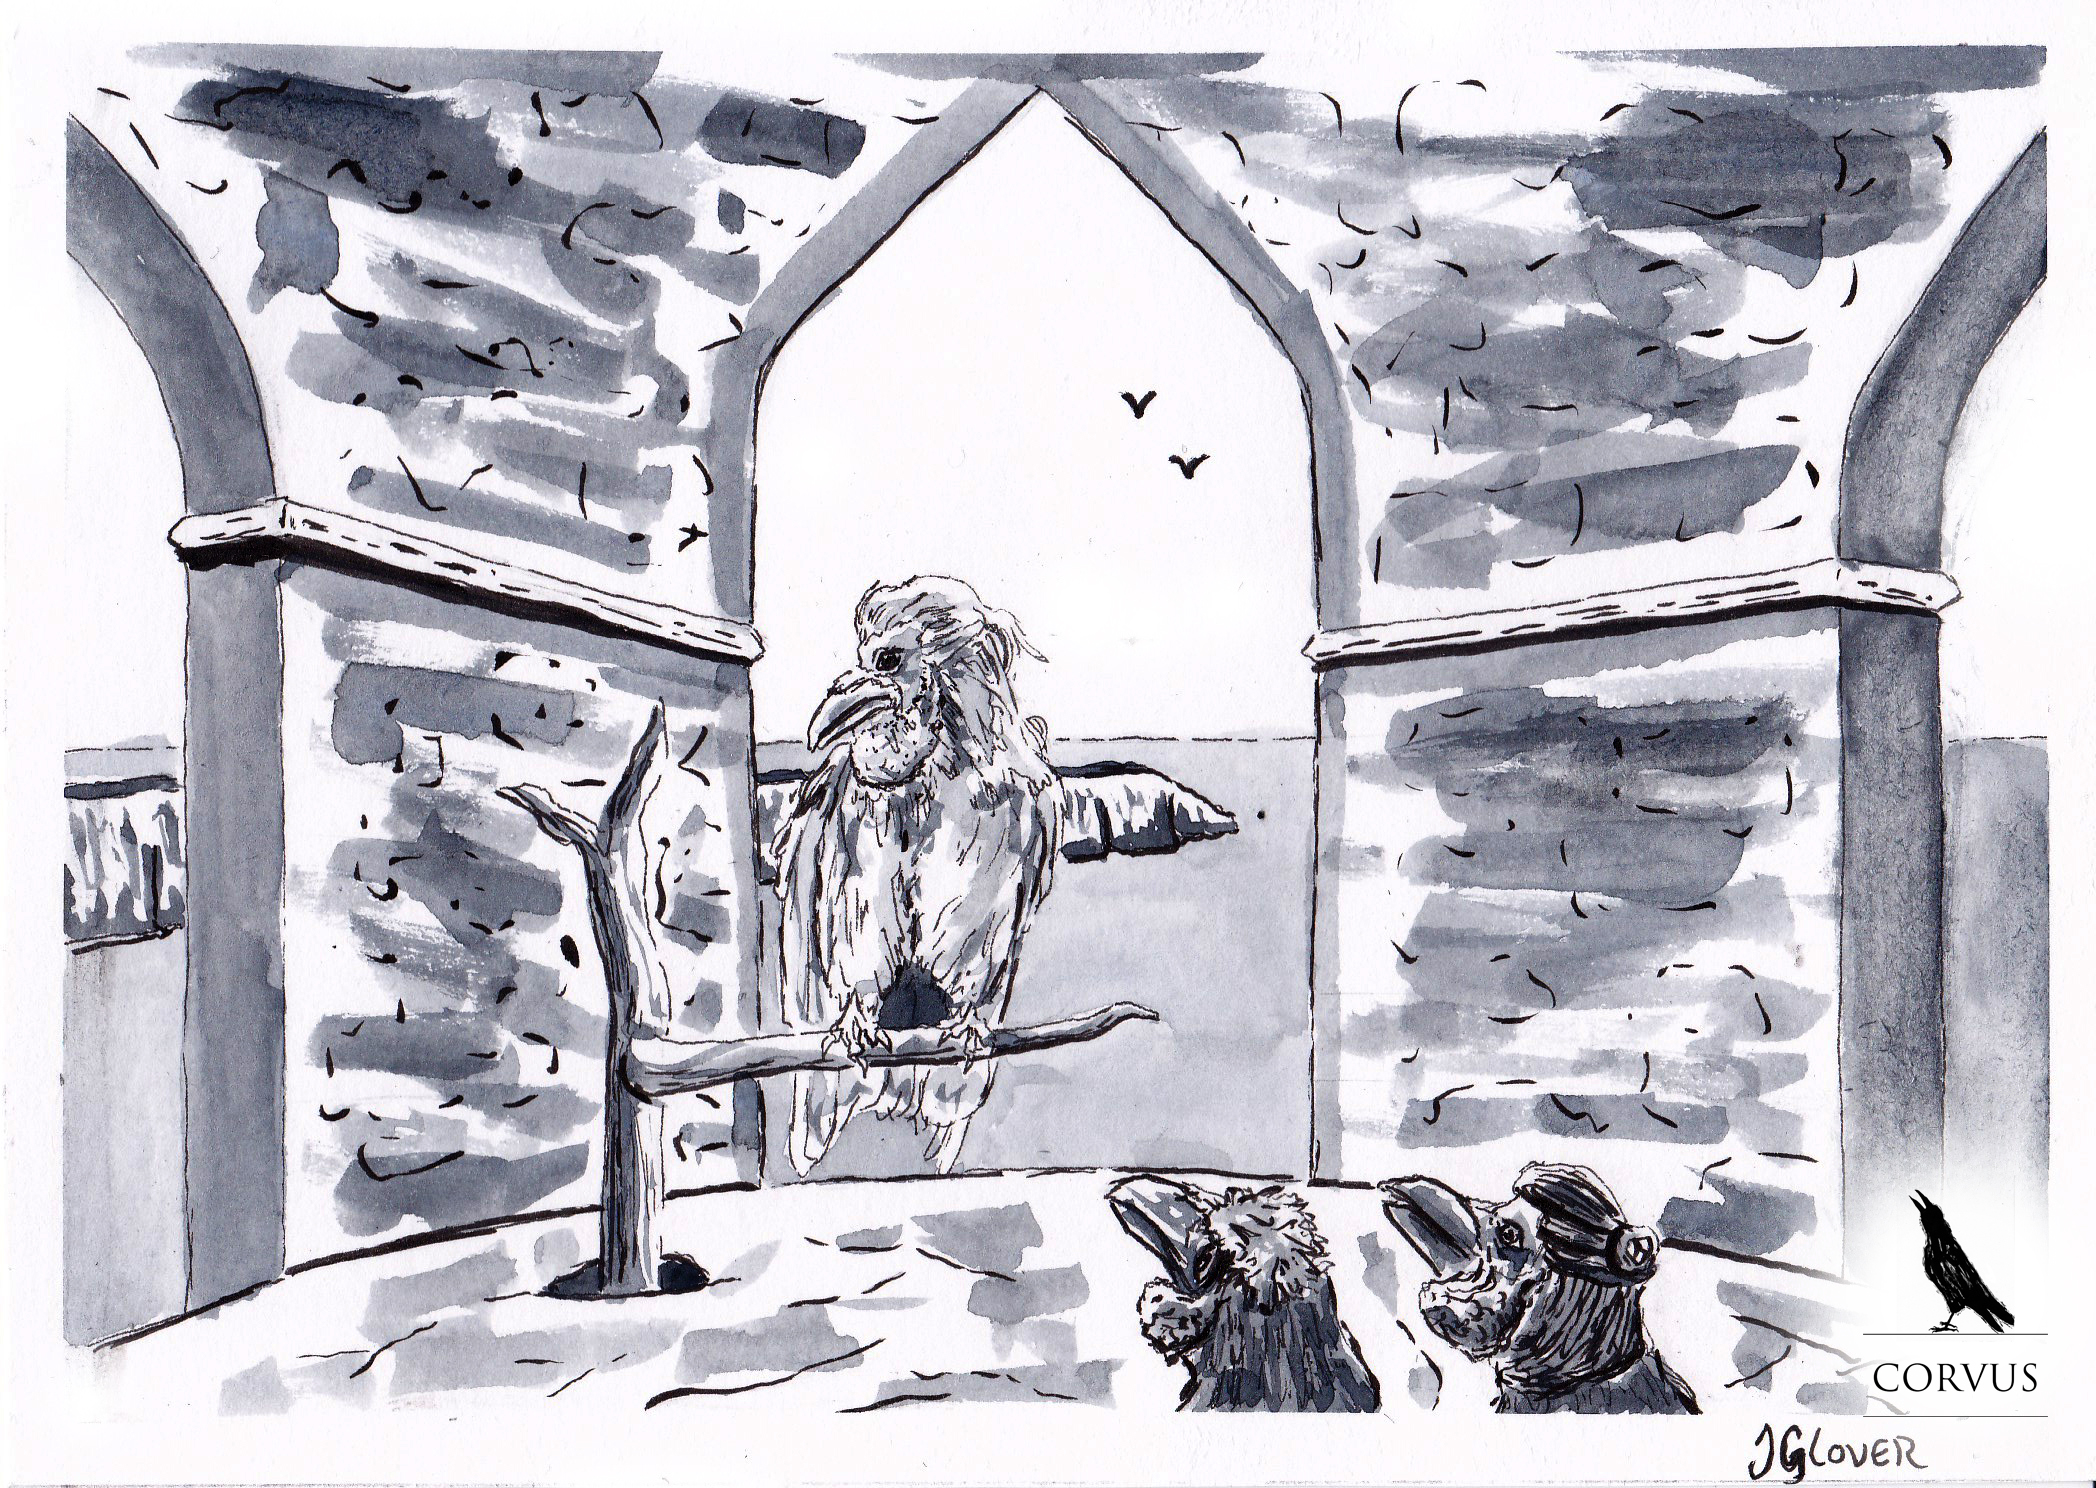 Corvus - graphic novel - raven - crow - webcomic - fantasy - art - illustration - story